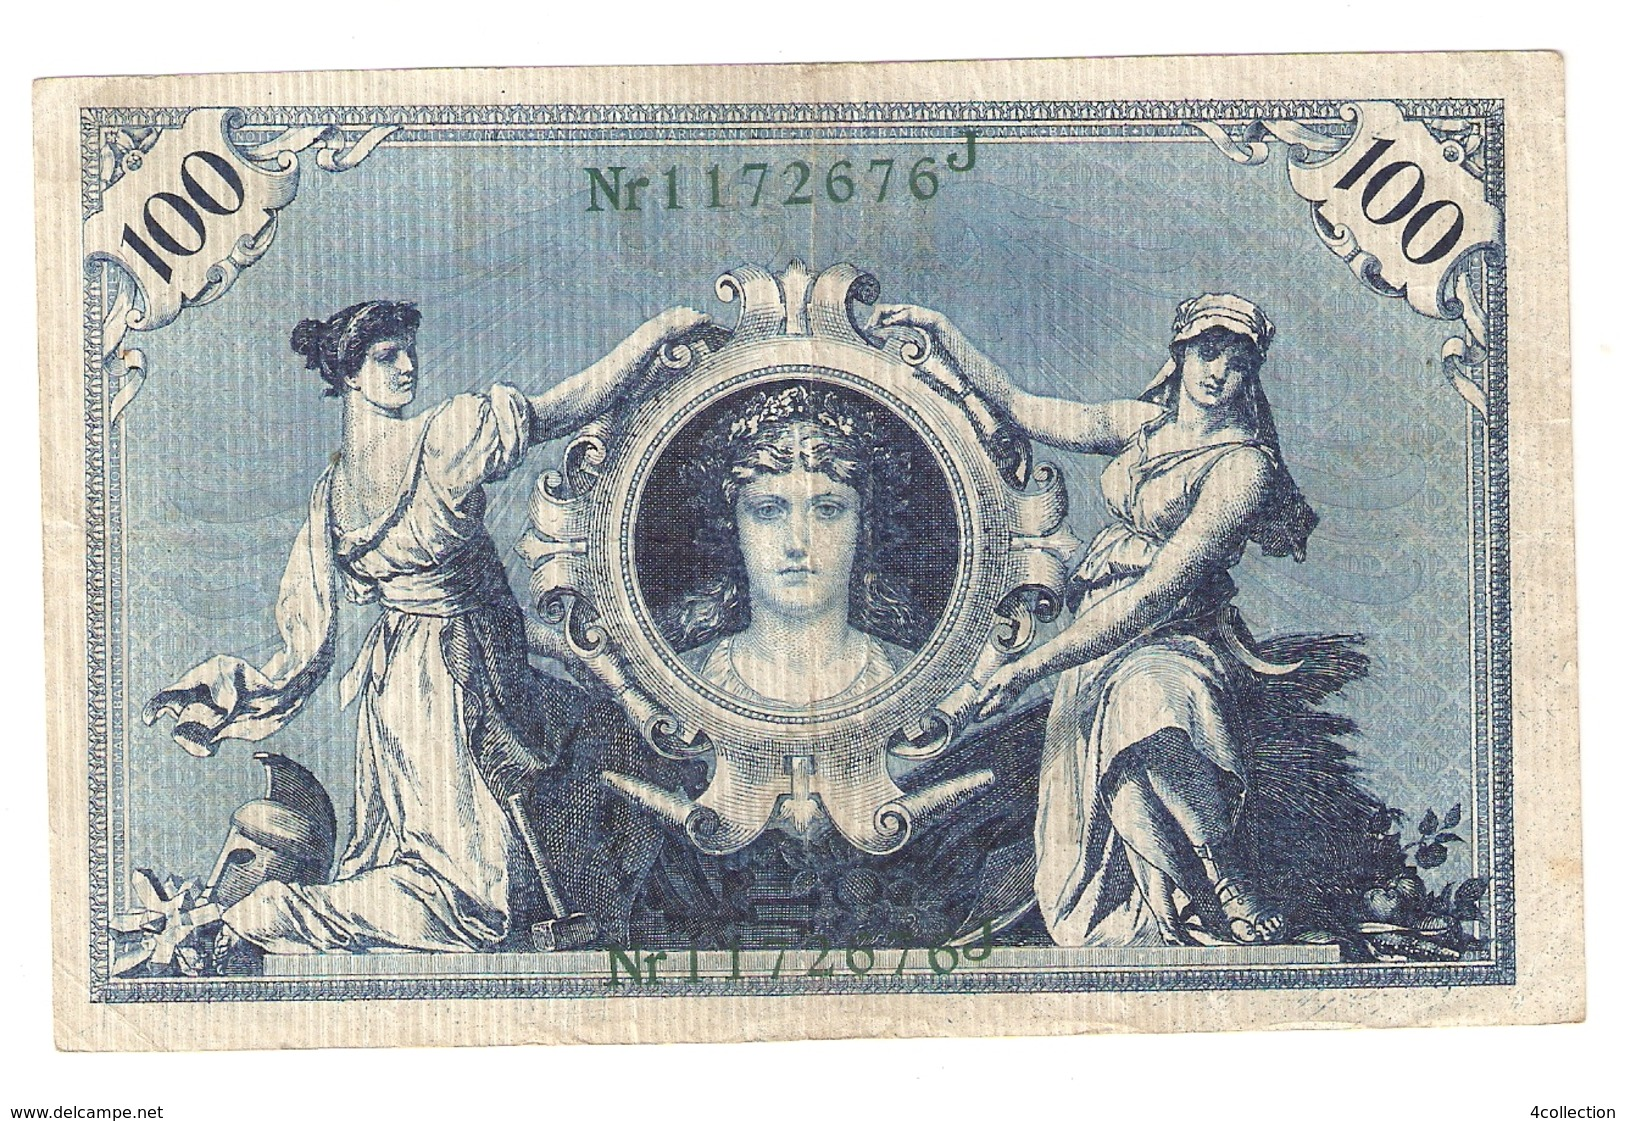 Pa6. Germany German Empire 100 Mark 1908 Reichsbanknote Green Seal & Ser. 1172676 J - [ 2] 1871-1918 : Duitse Rijk